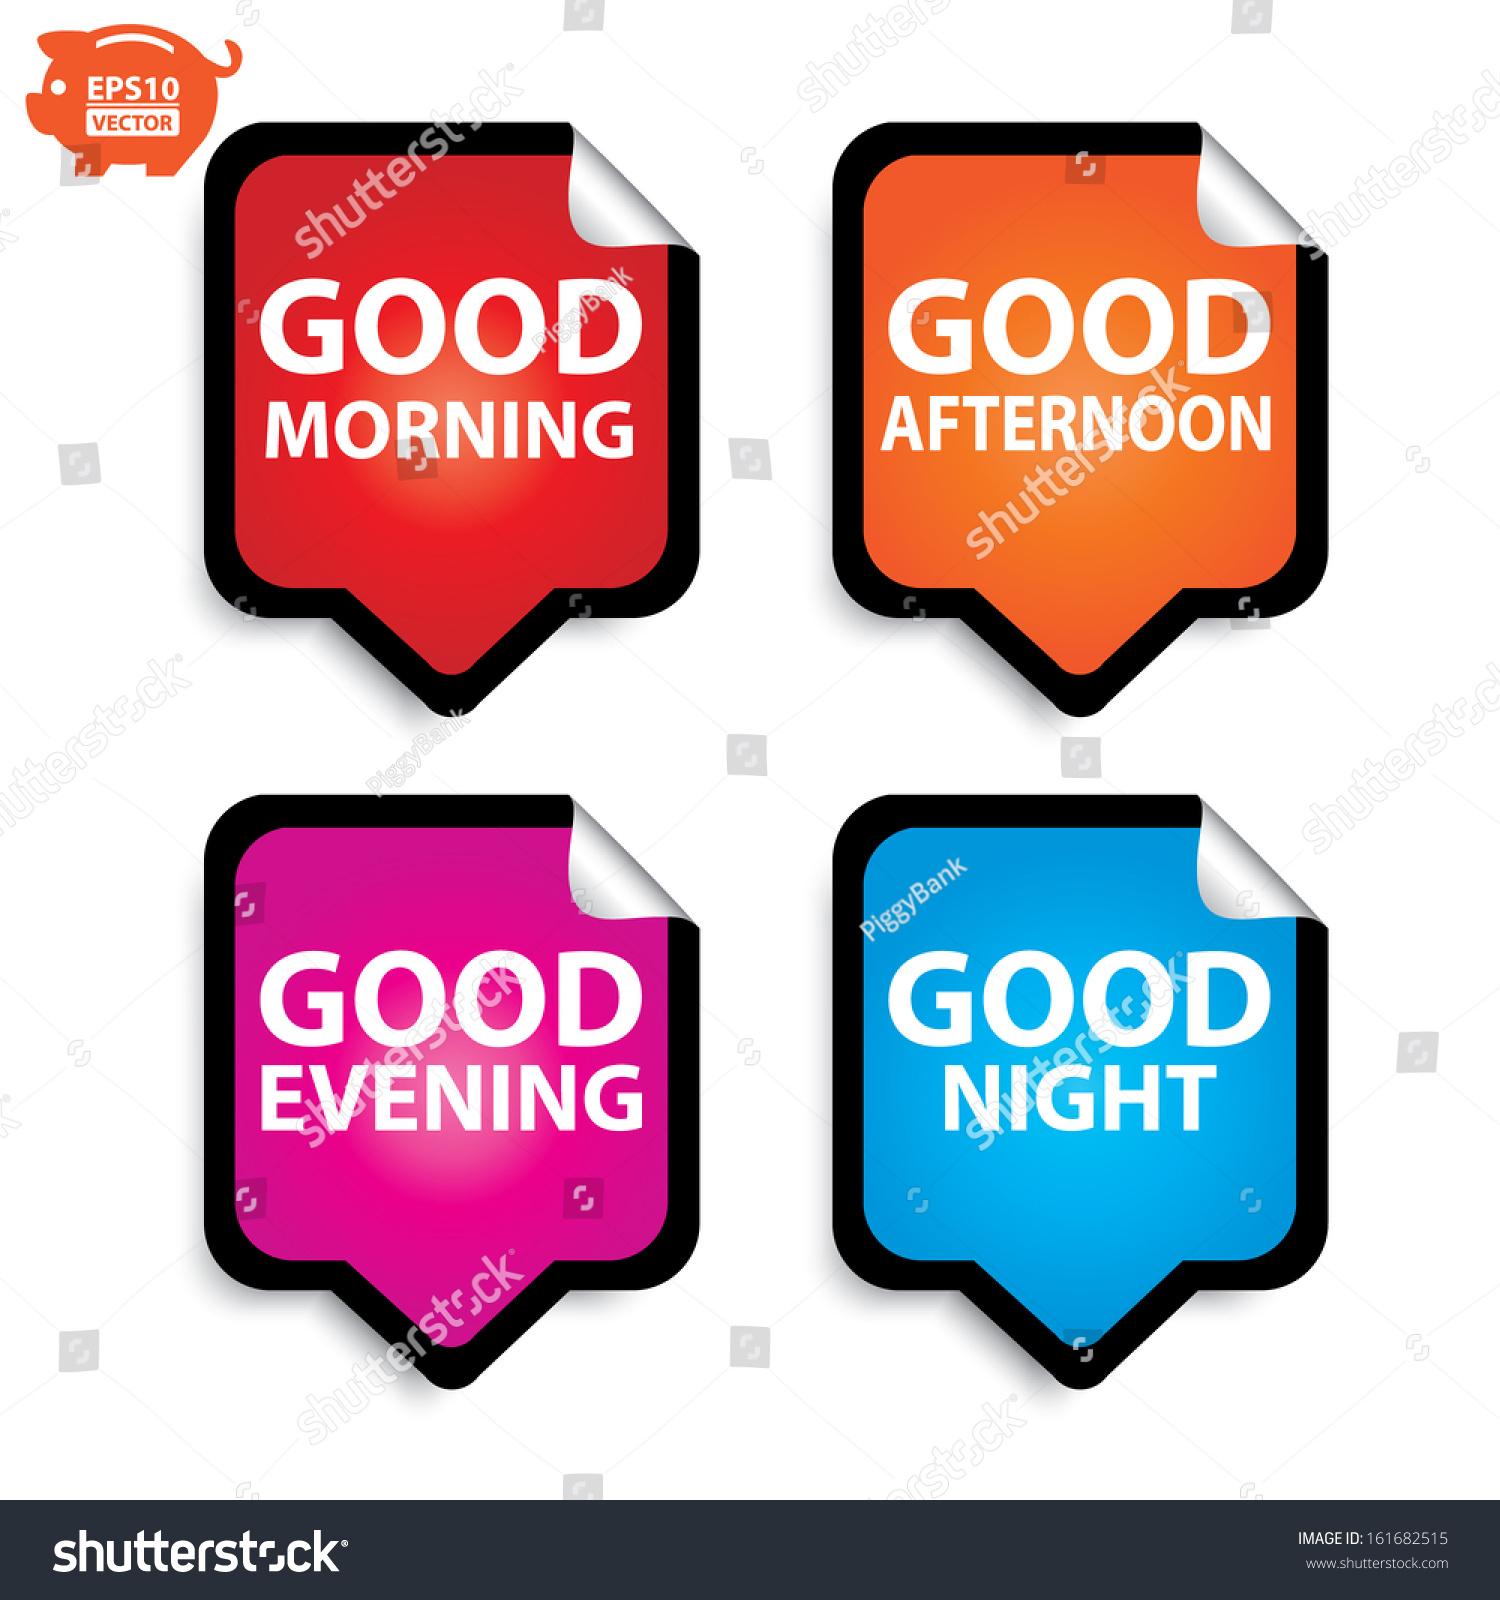 Vector Good Morning Good Afternoon Good Evening Good